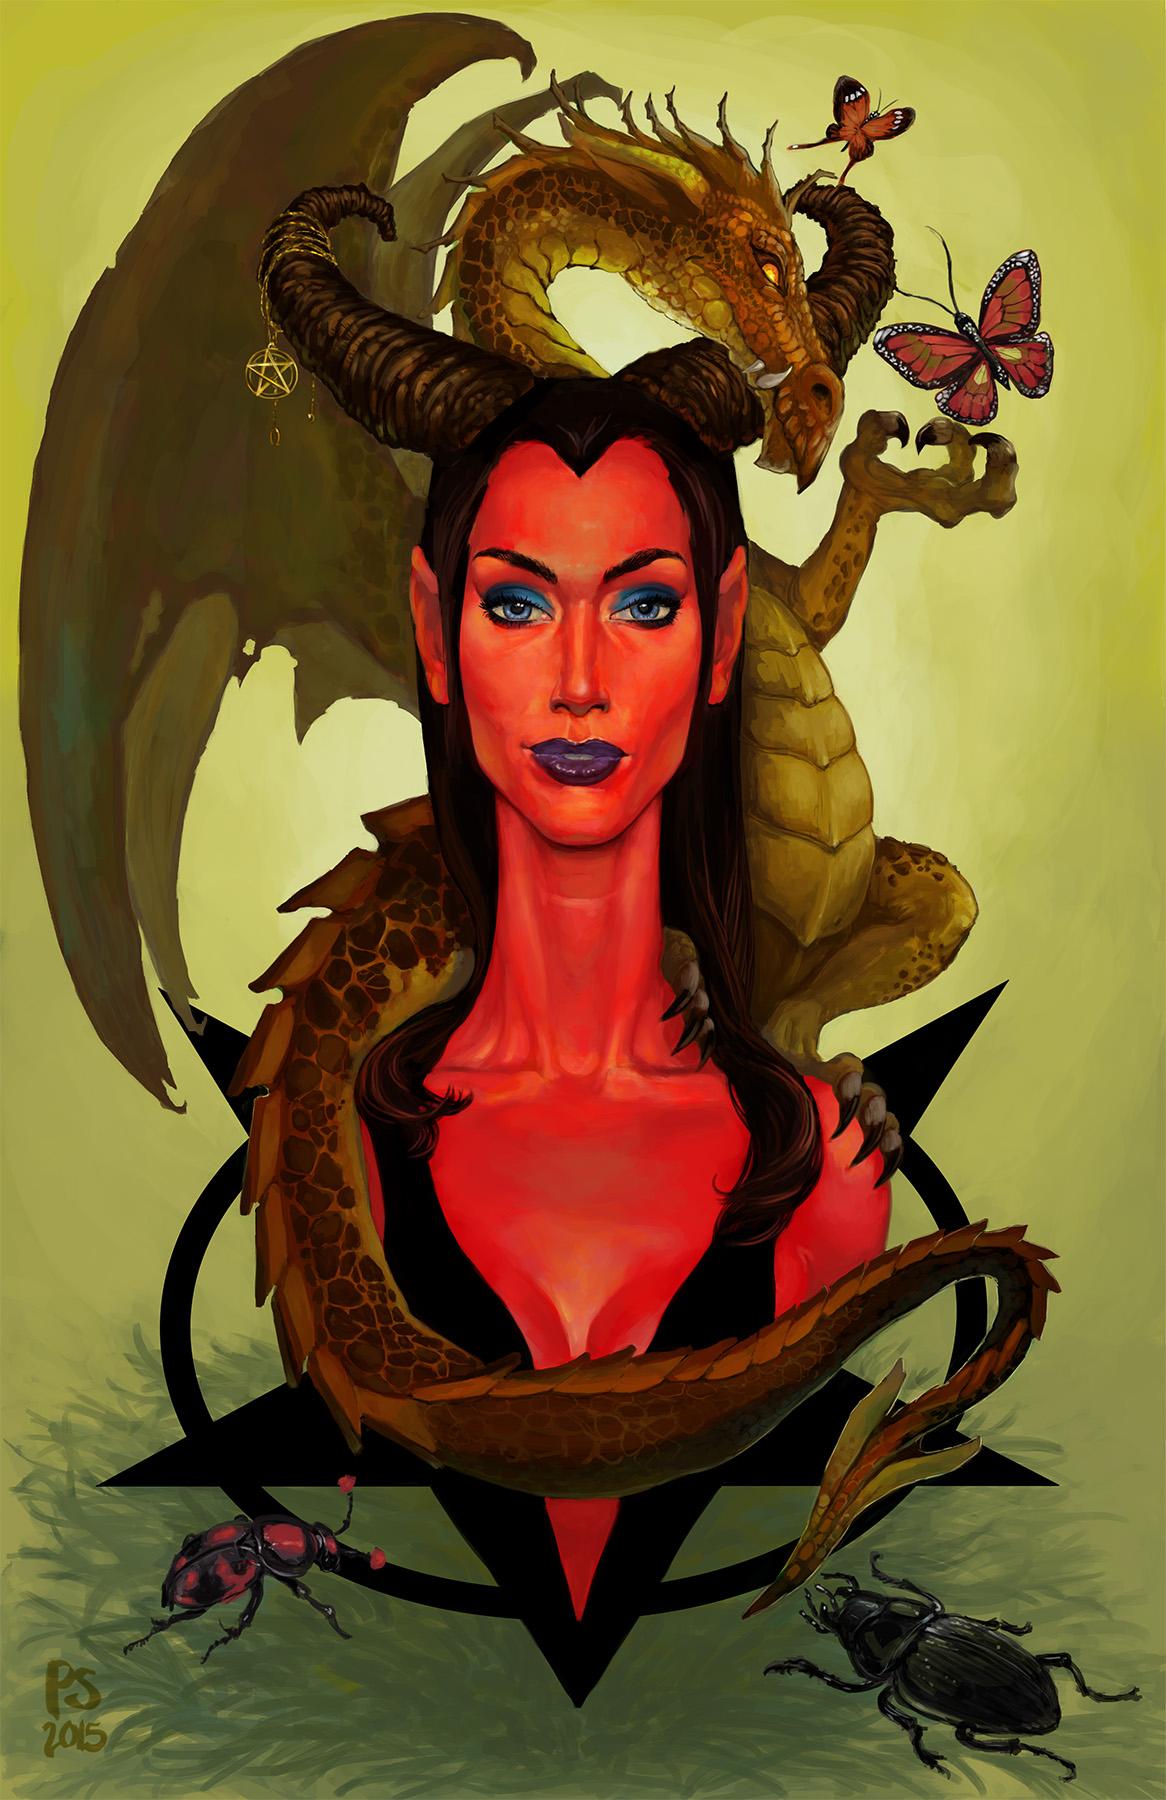 Devilene-psmith_Ifx.jpg